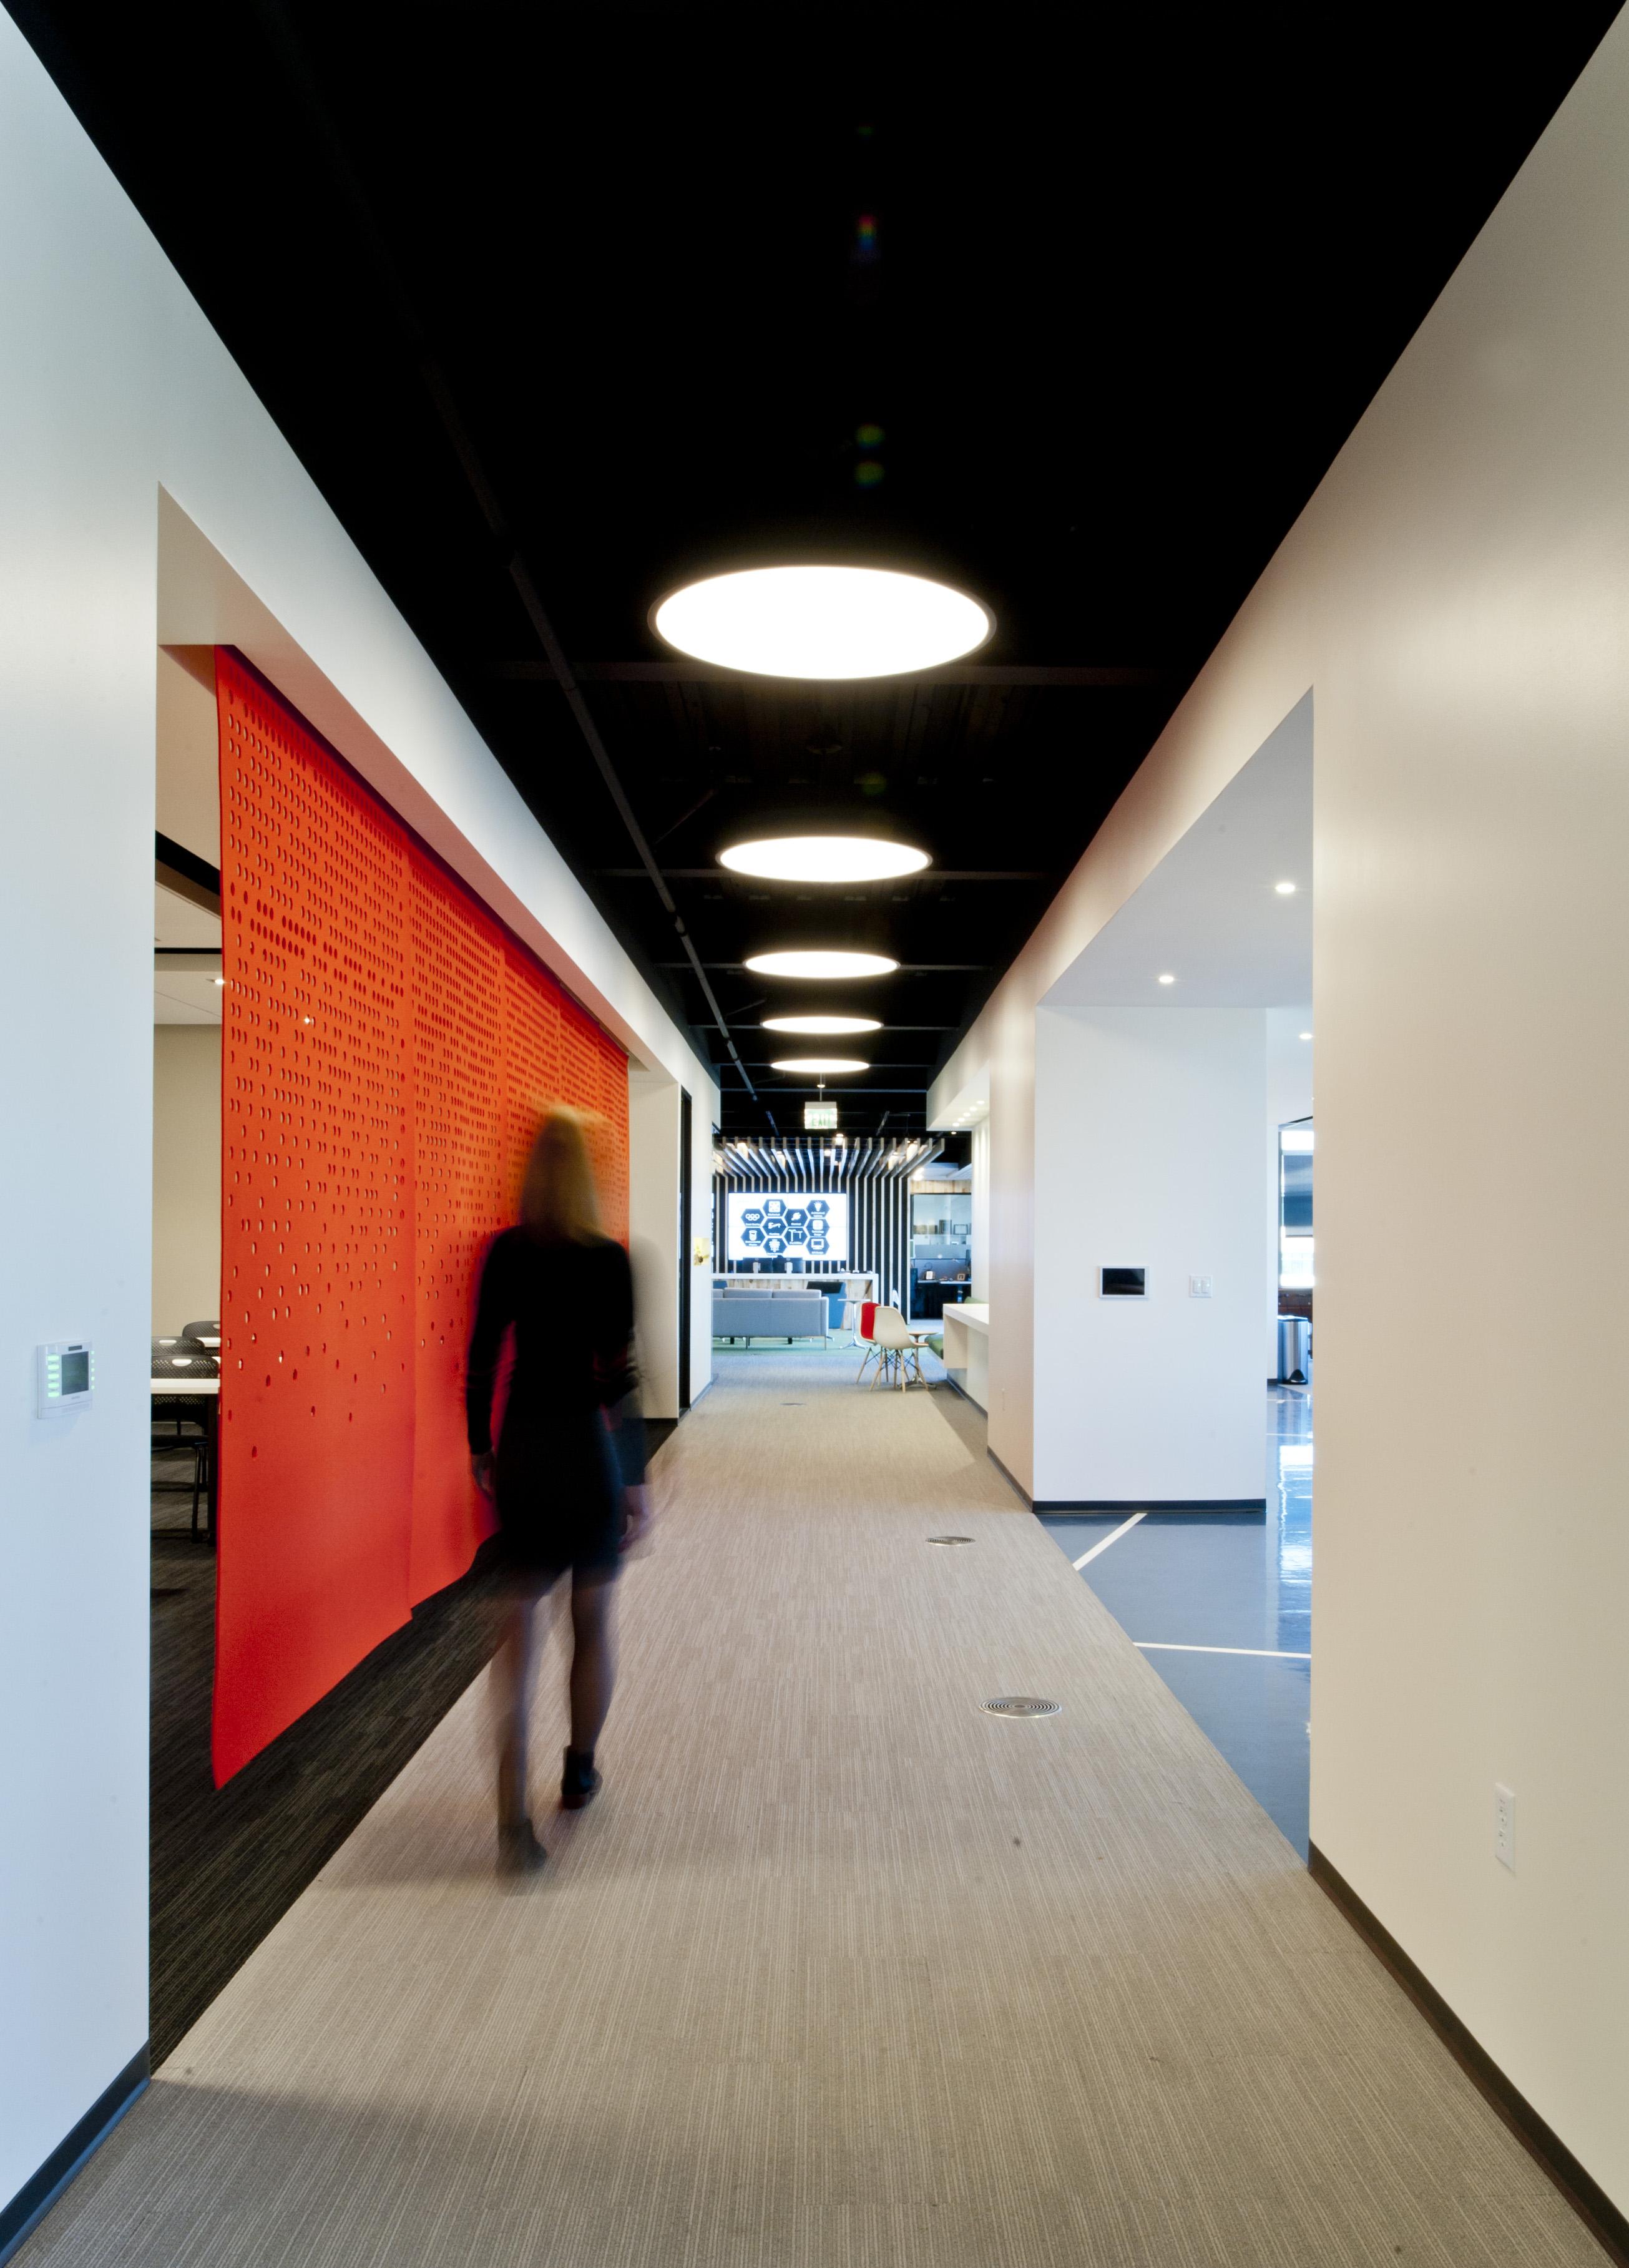 Open Studio Archicture ME Engineers Lobby Hallway OSA